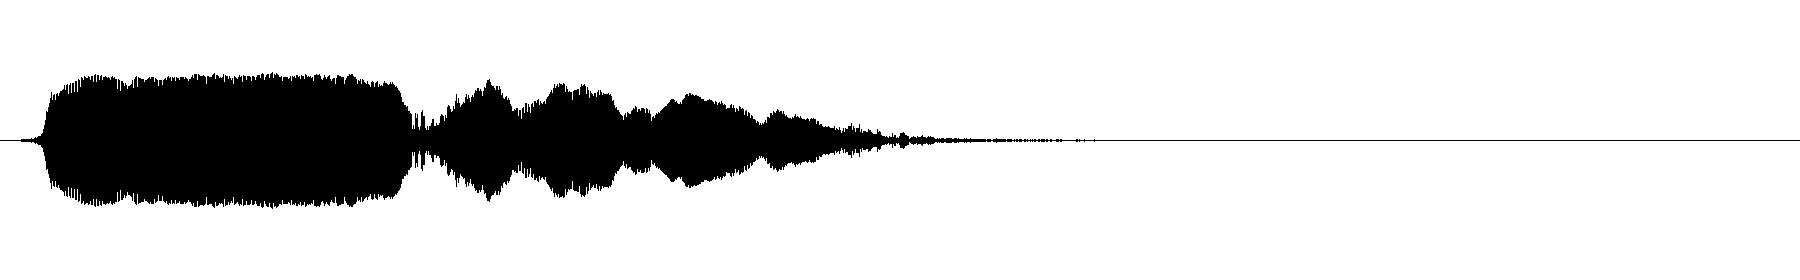 vox 19